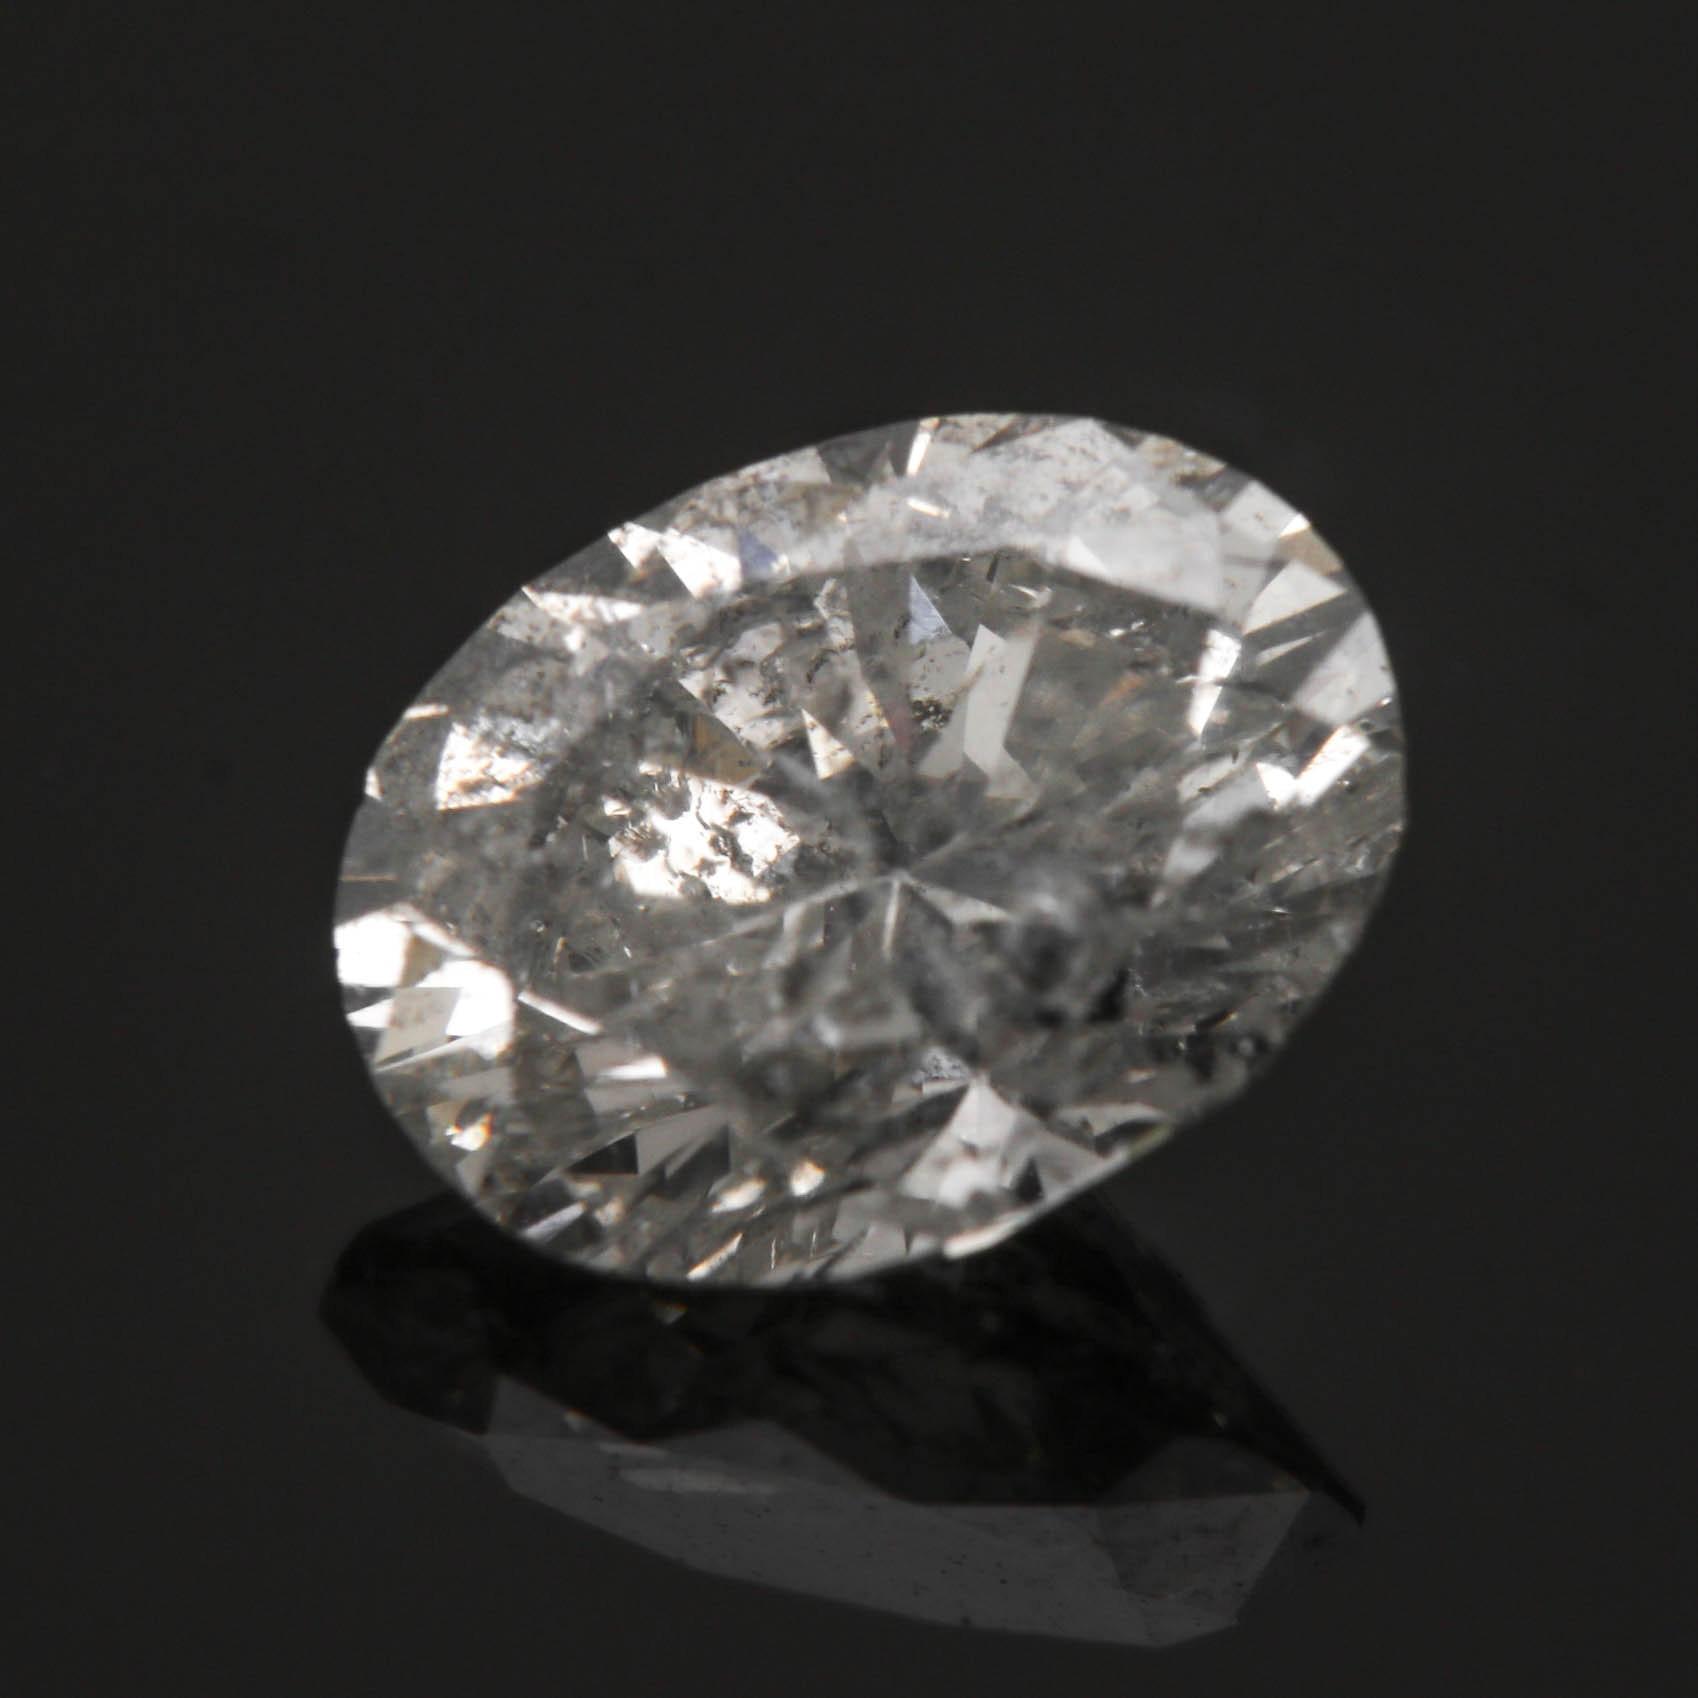 Loose 0.81 CT Diamond